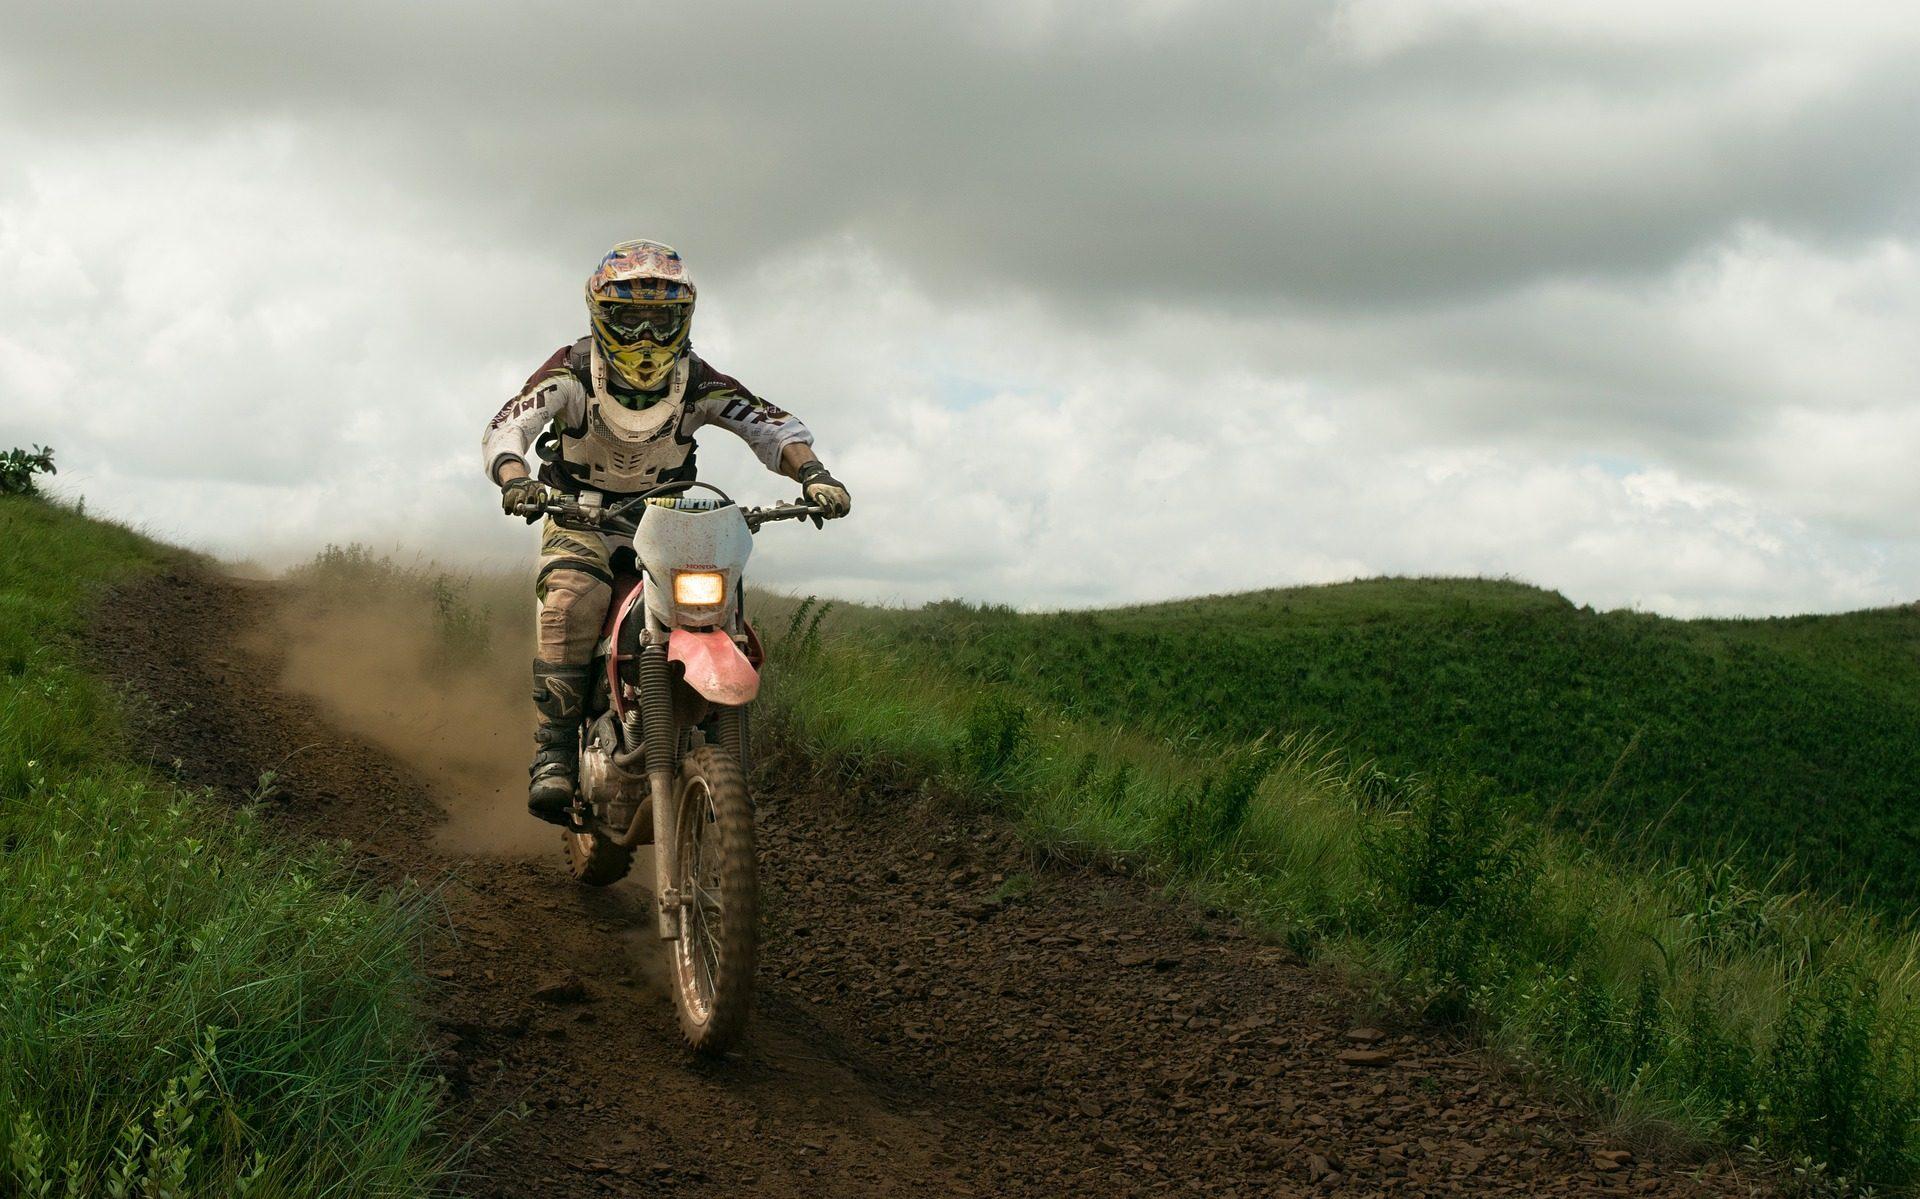 motocicleta, motocross, campo, camino, nubes - Fondos de Pantalla HD - professor-falken.com